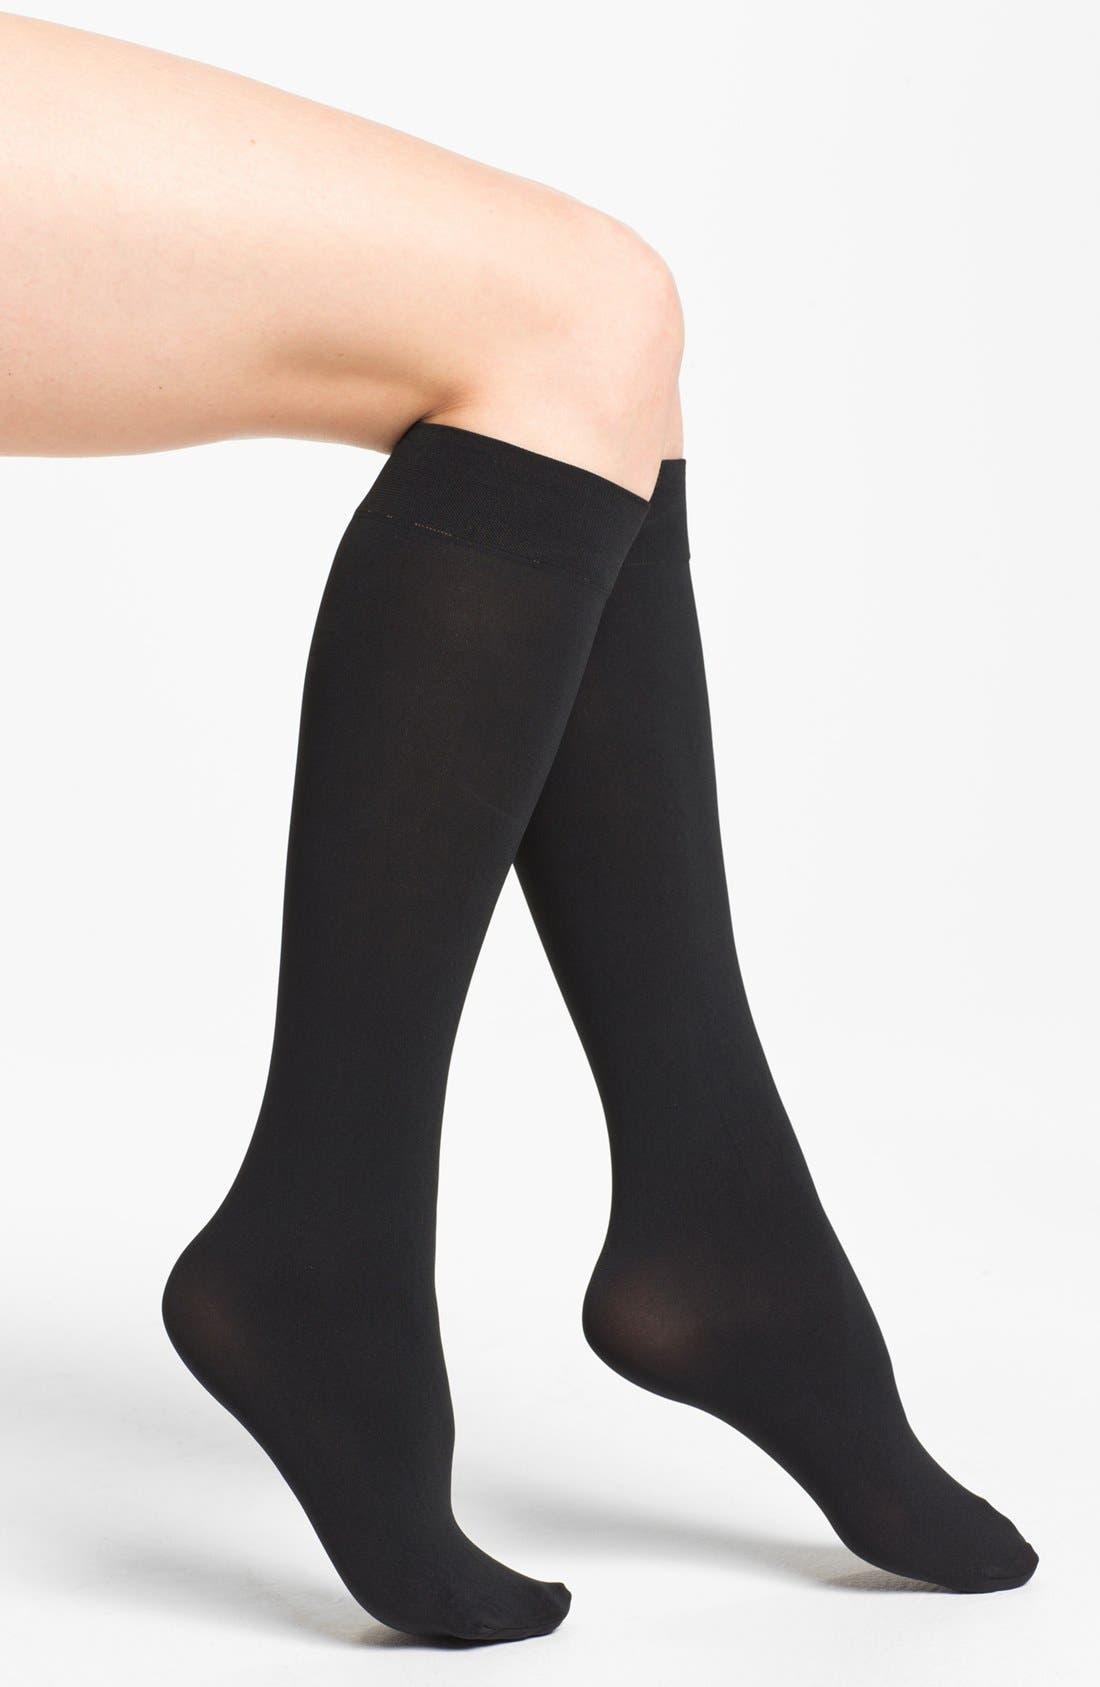 Alternate Image 1 Selected - DKNY Opaque Microfiber Knee Highs